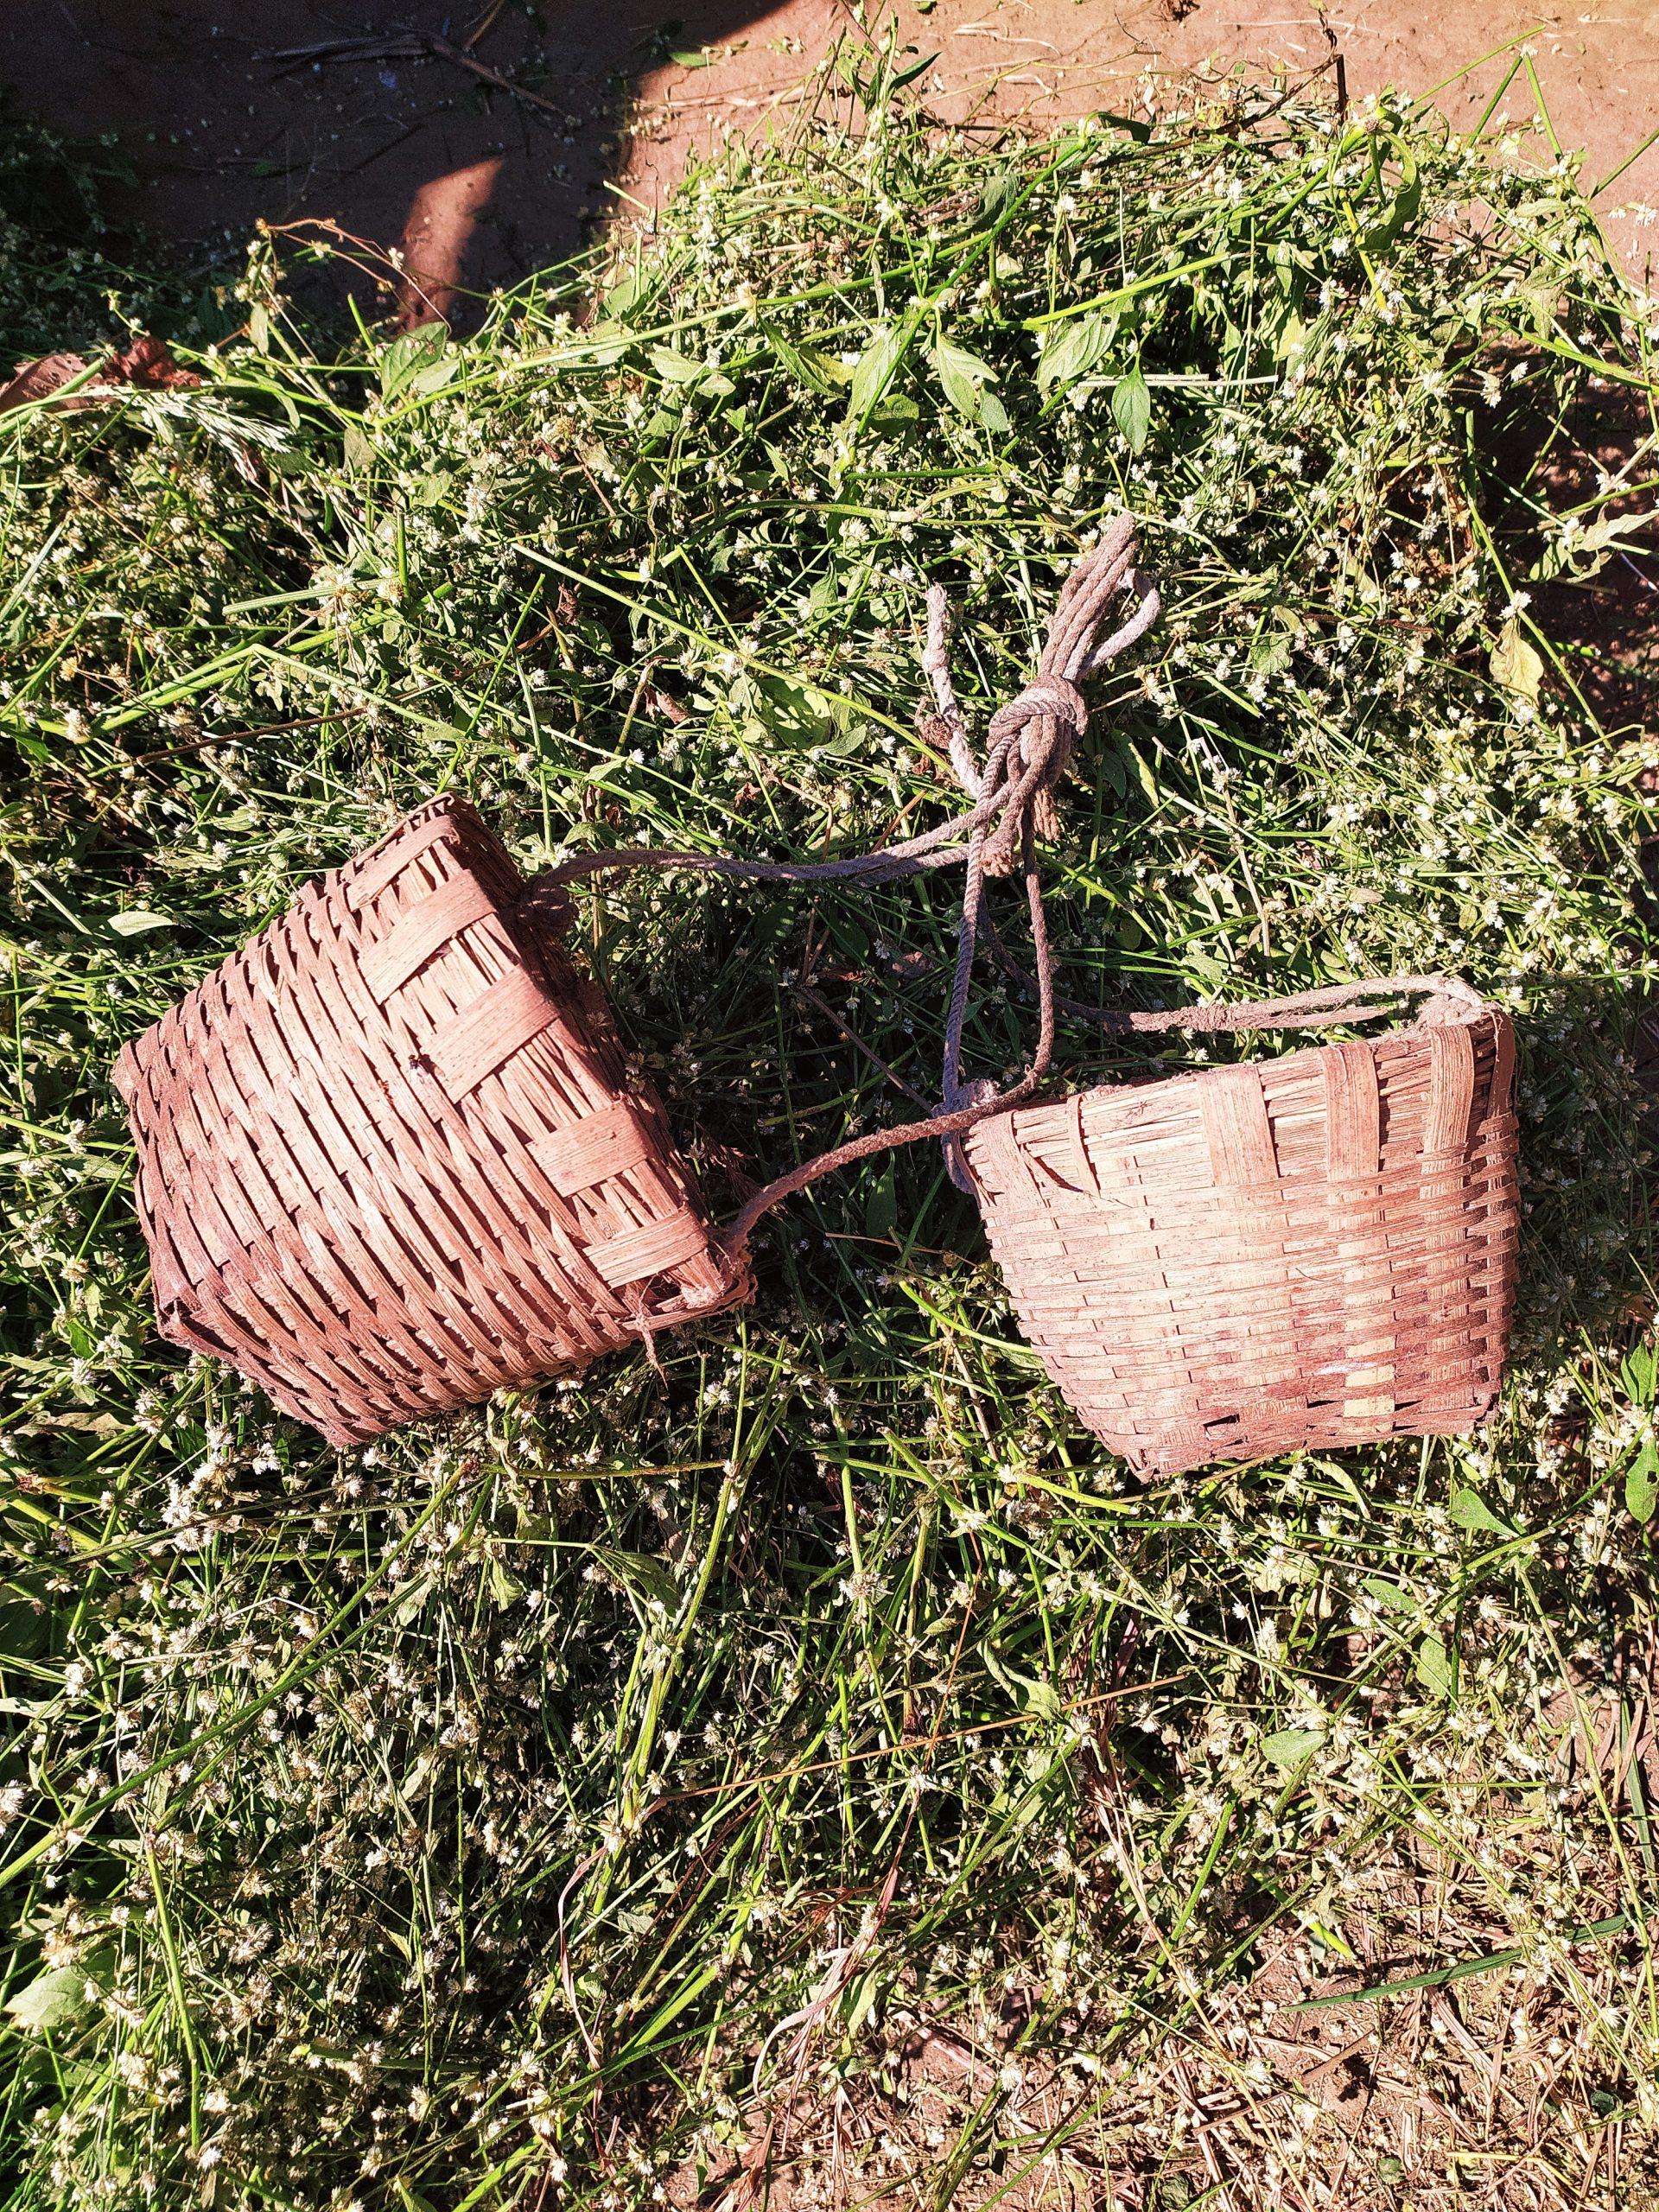 Wooden baskets of farmers